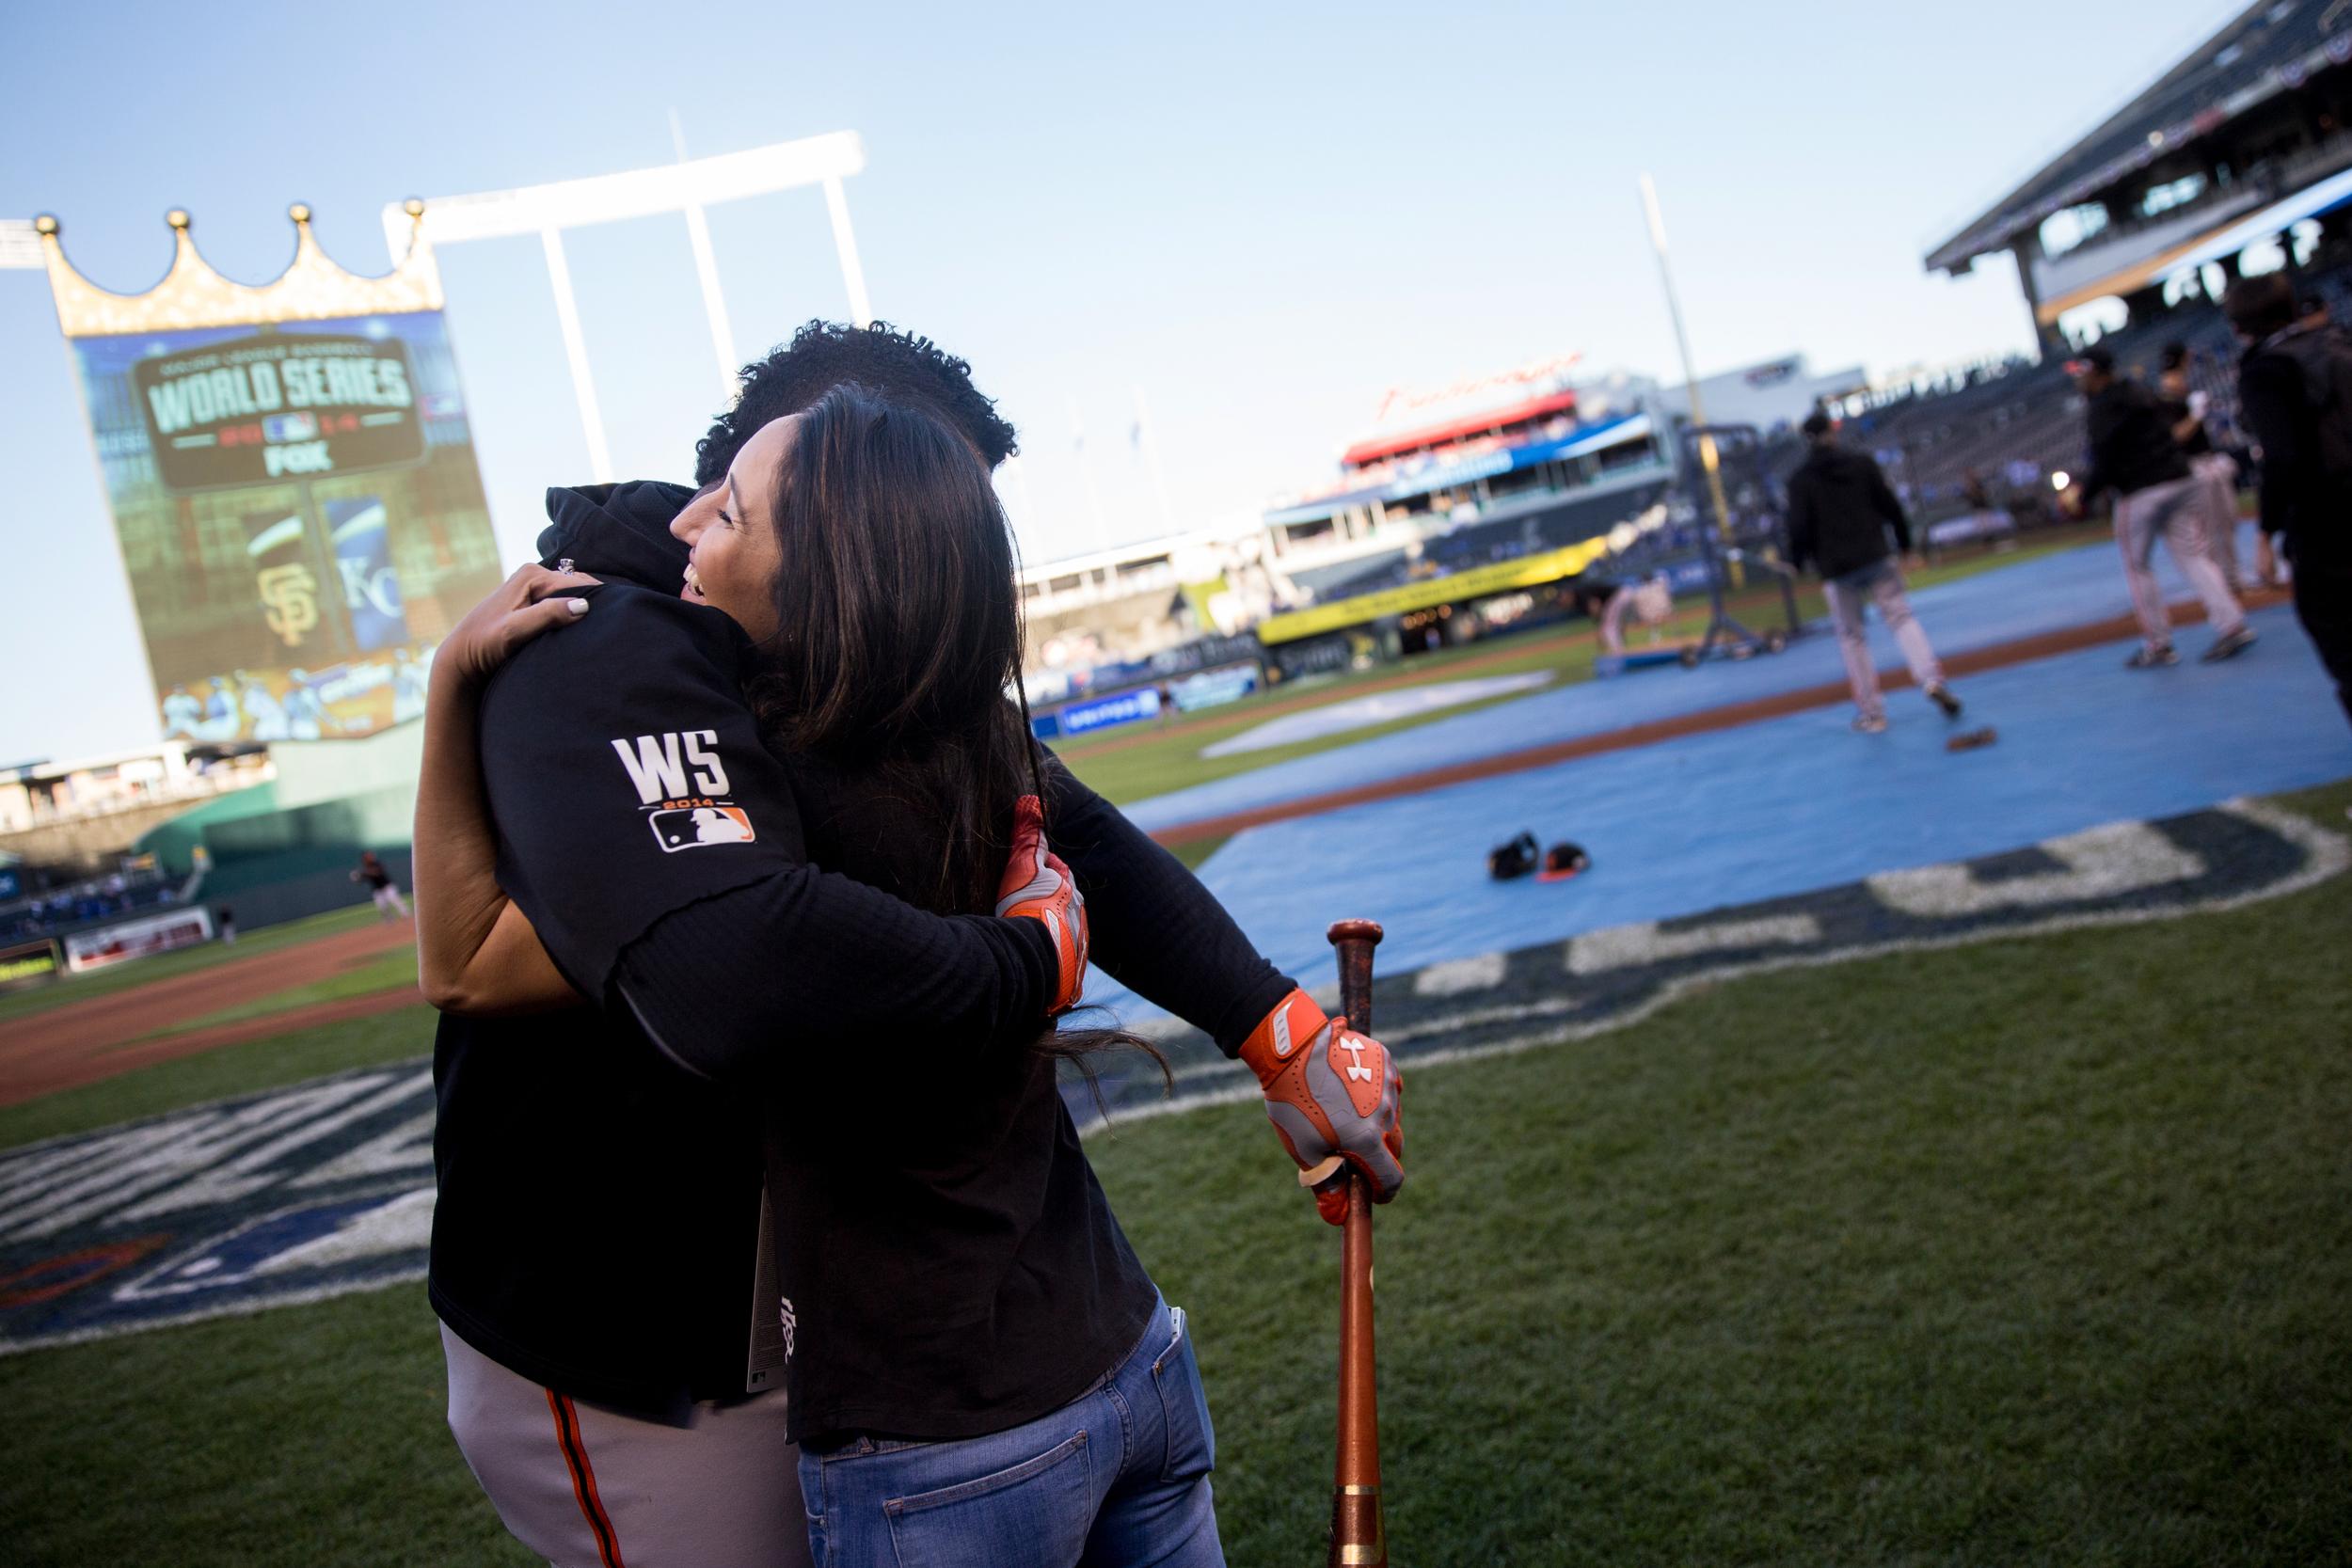 Angela Lauren World Series Pablo Sandoval